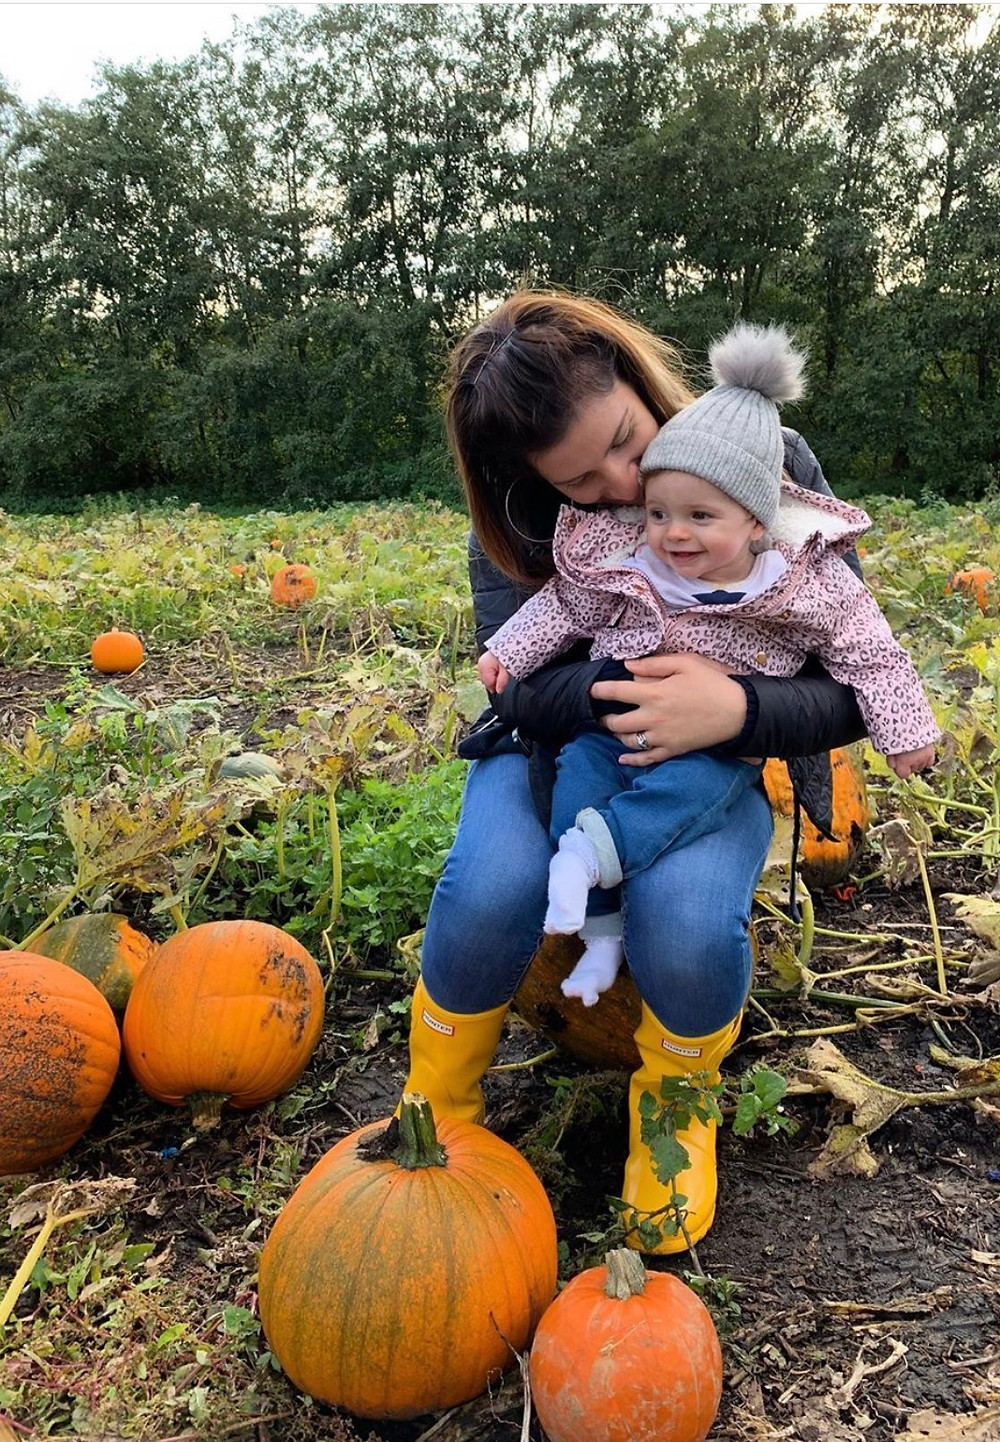 Mum with baby looking at pumpkins